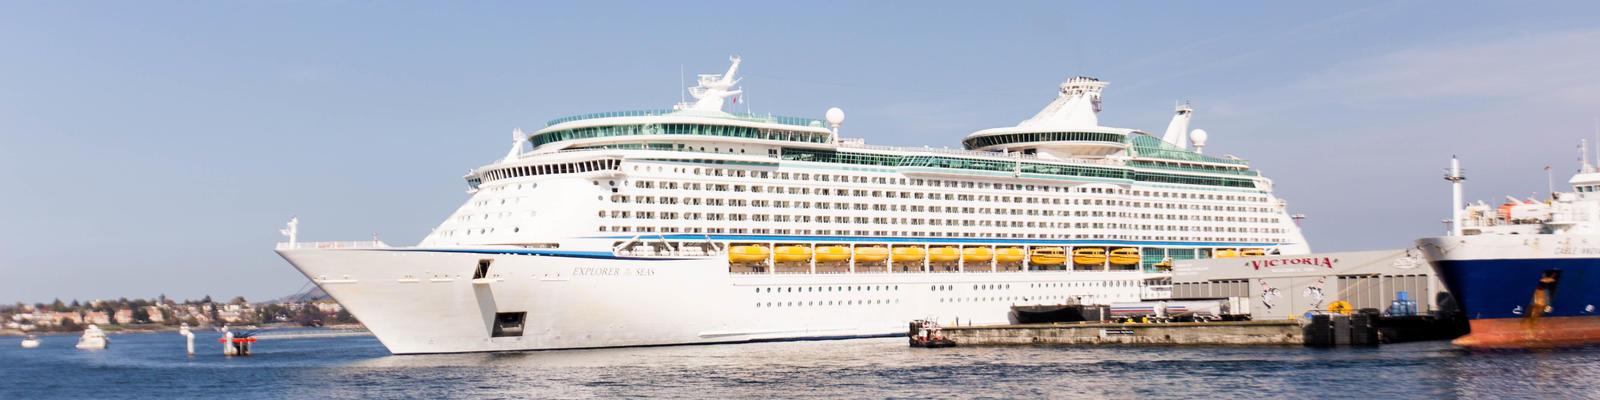 Royal Caribbean's Cruise Ship Classes (Photo: Cruise Critic)